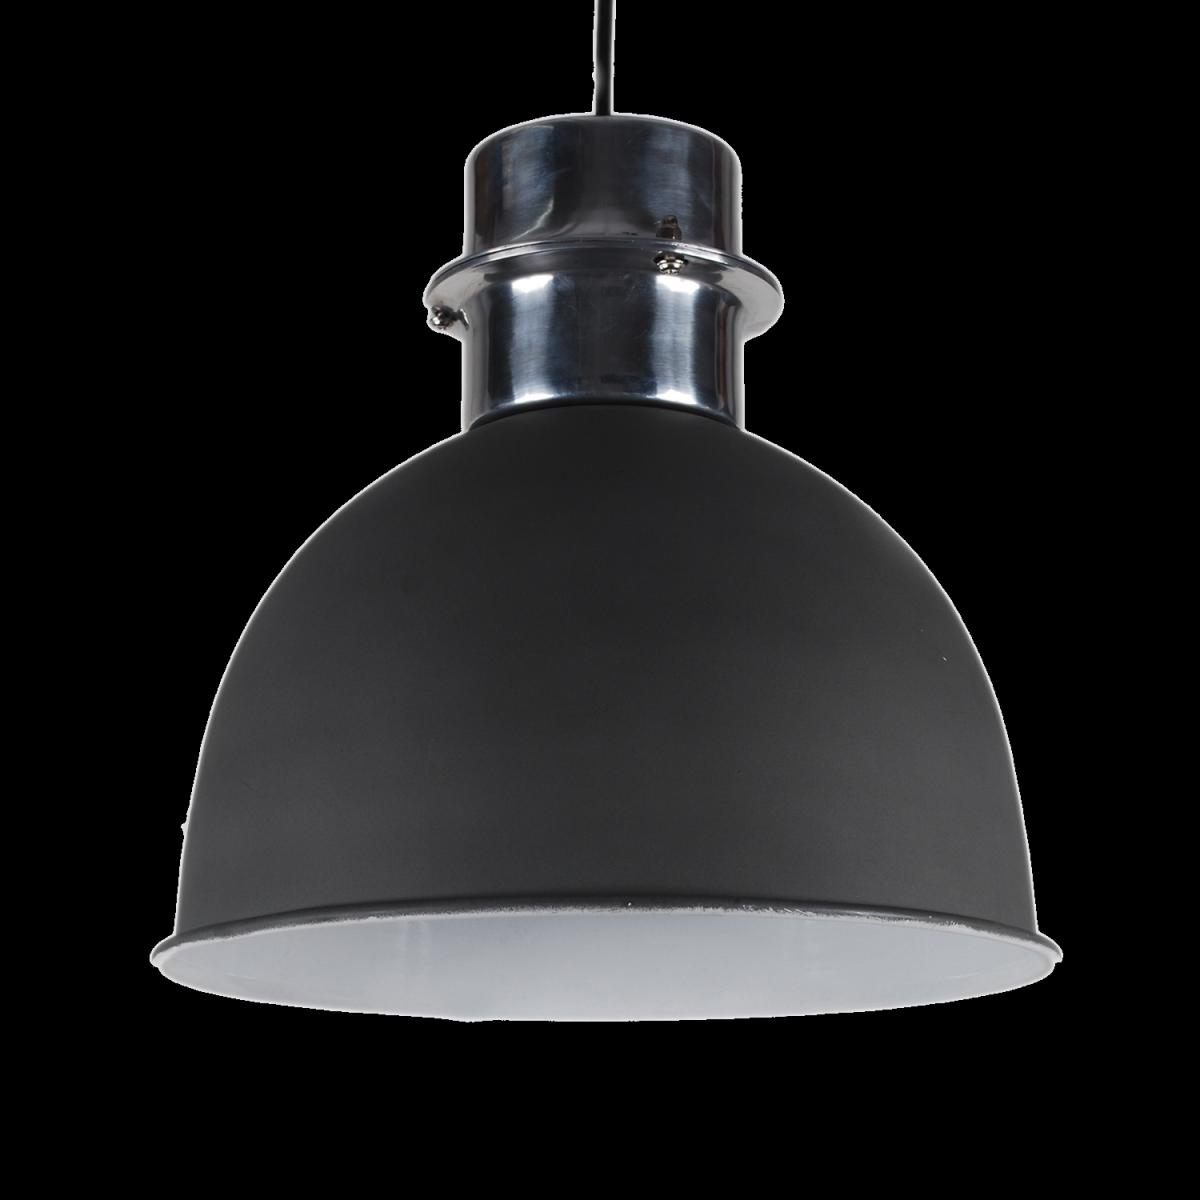 pendelleuchte grau matt metall h ngelampe metall grau durchmesser 30 cm. Black Bedroom Furniture Sets. Home Design Ideas